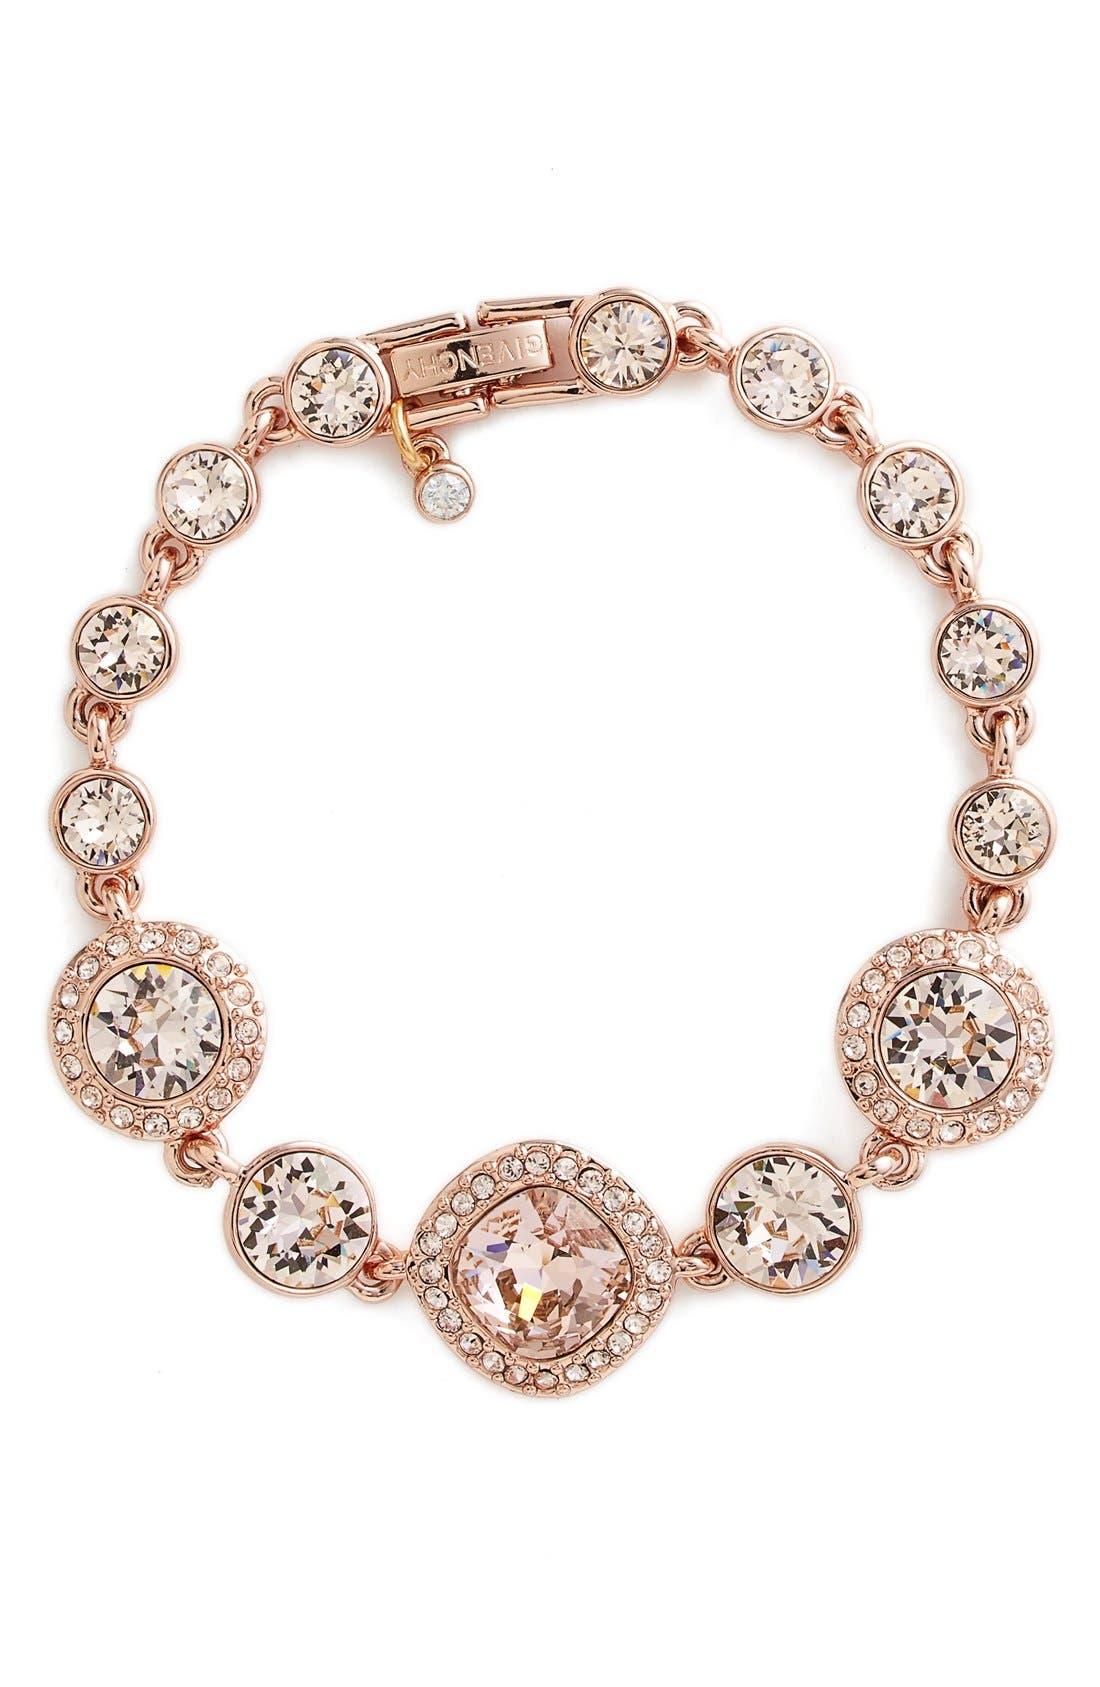 Main Image - Givenchy Crystal Line Bracelet